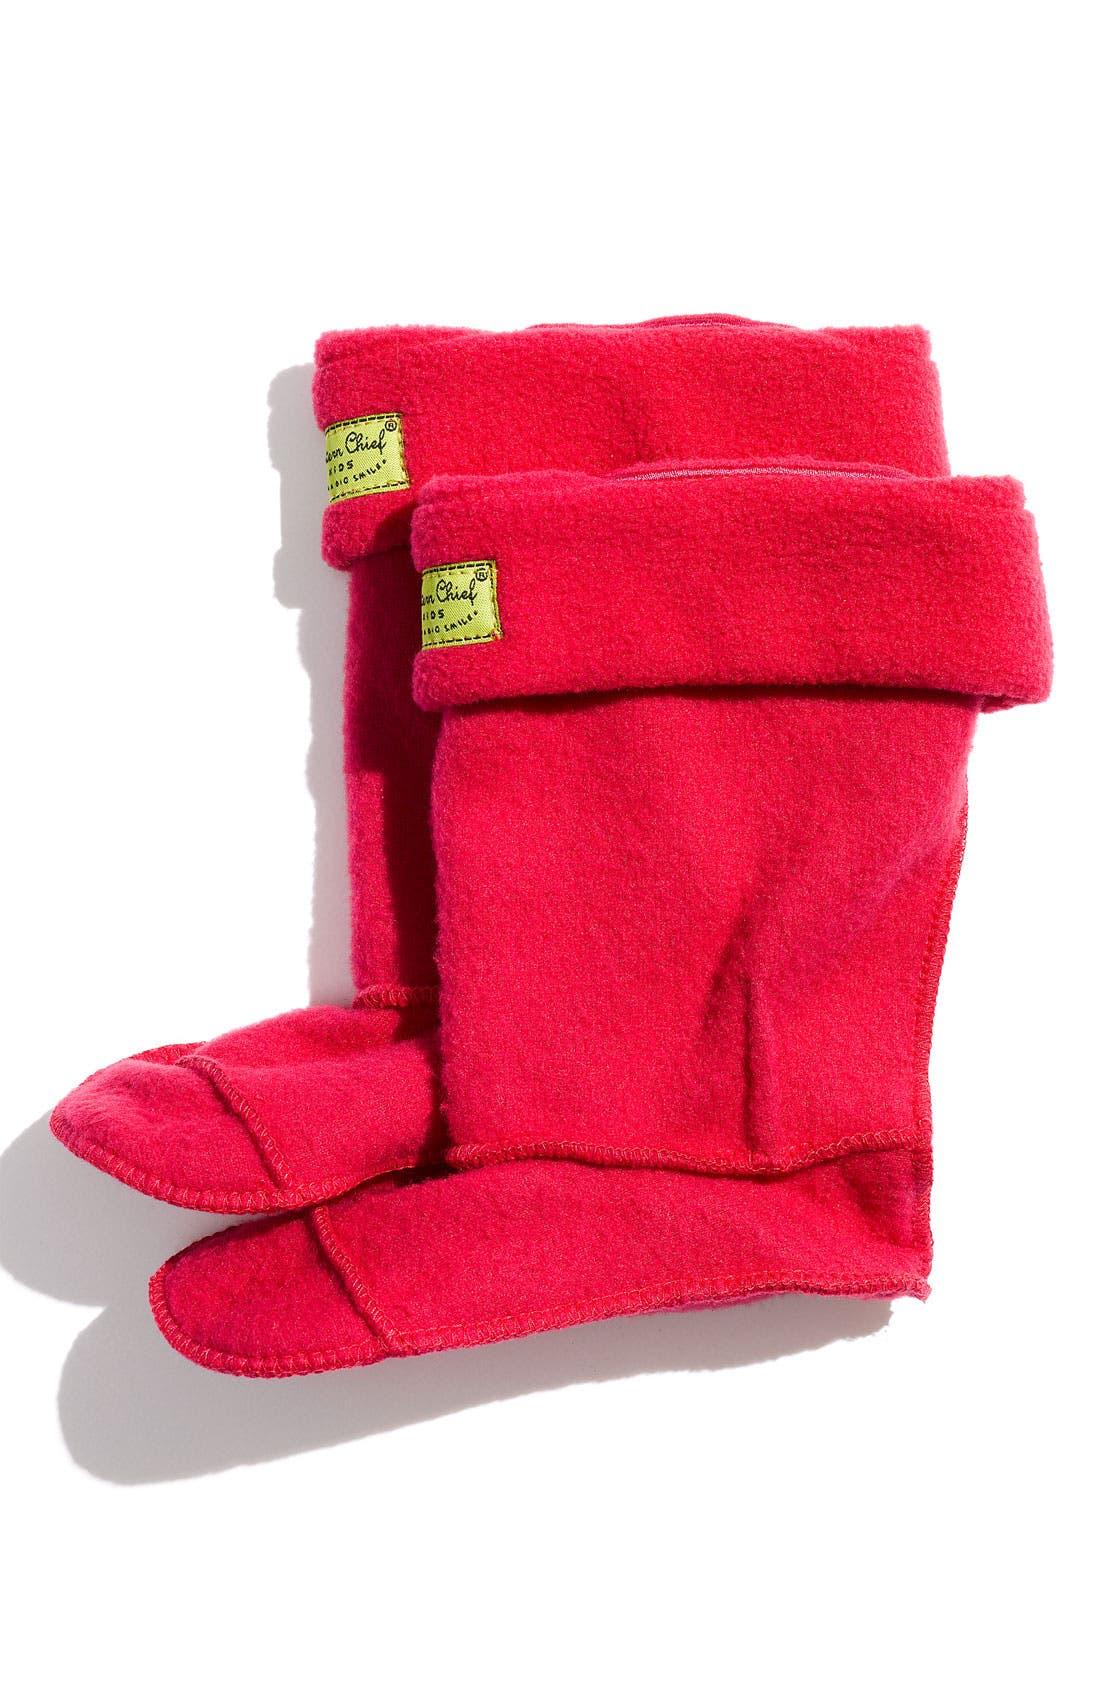 Alternate Image 1 Selected - Western Chief Fleece Boot Socks (Walker, Toddler & Little Kid)